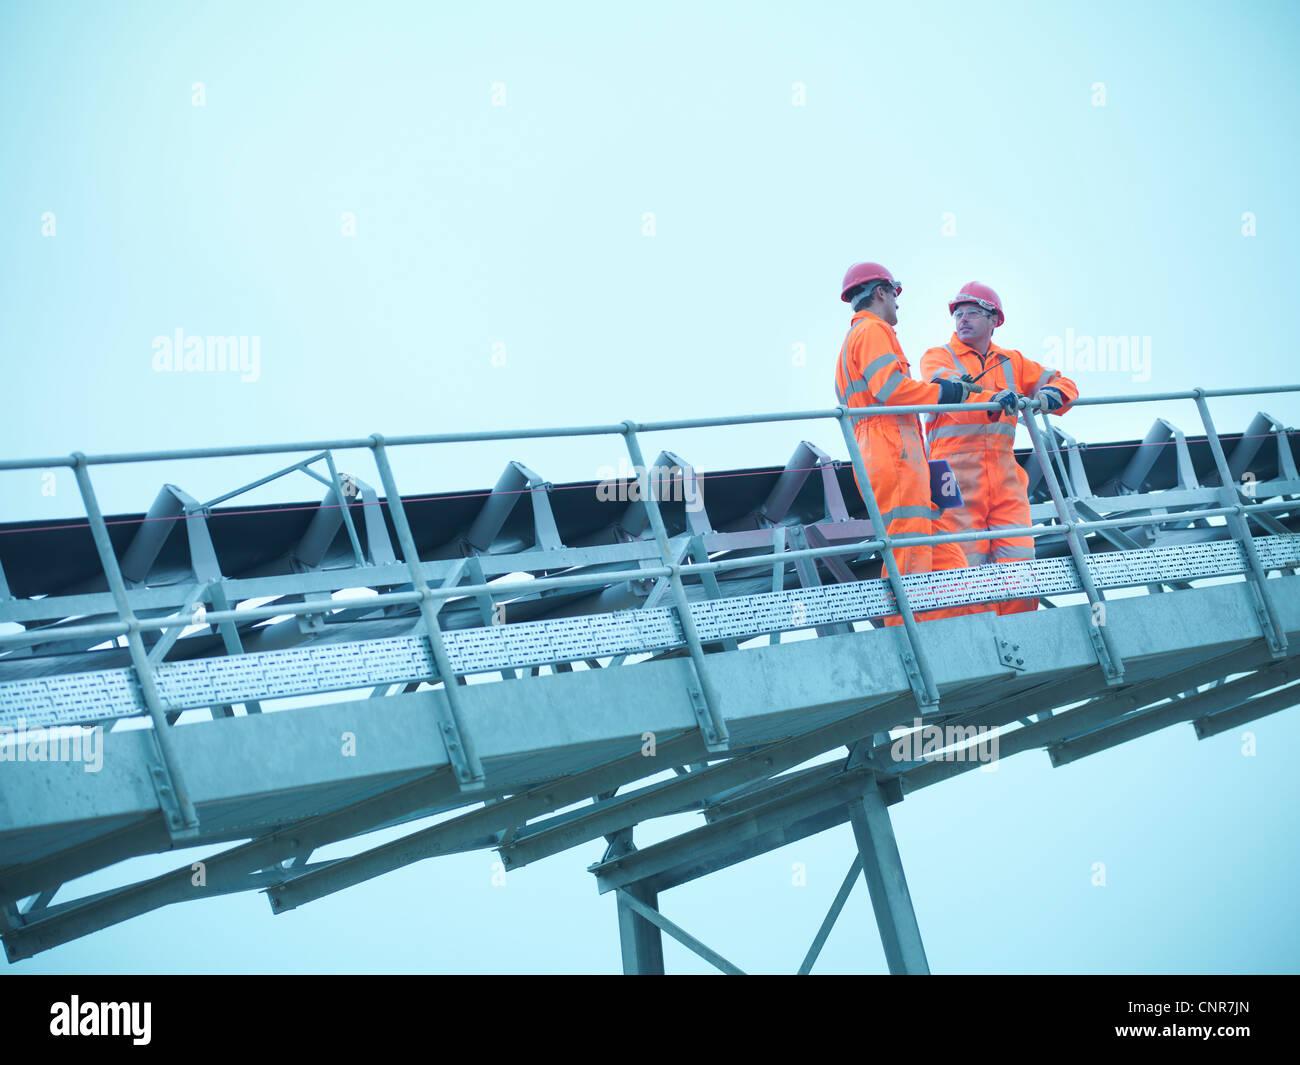 Worker climbing screening conveyor - Stock Image